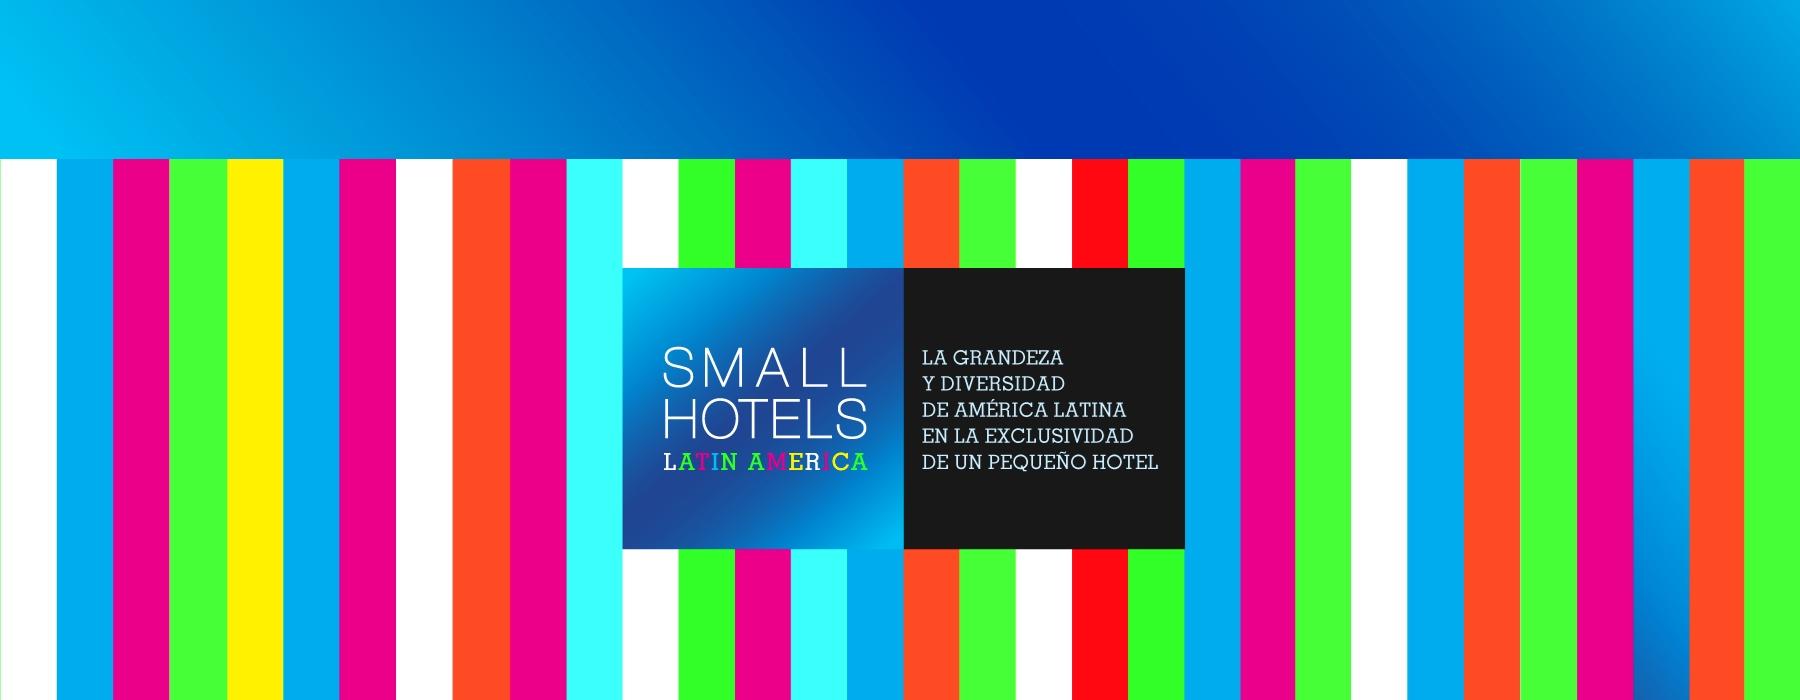 SMALL HOTELS LATAM